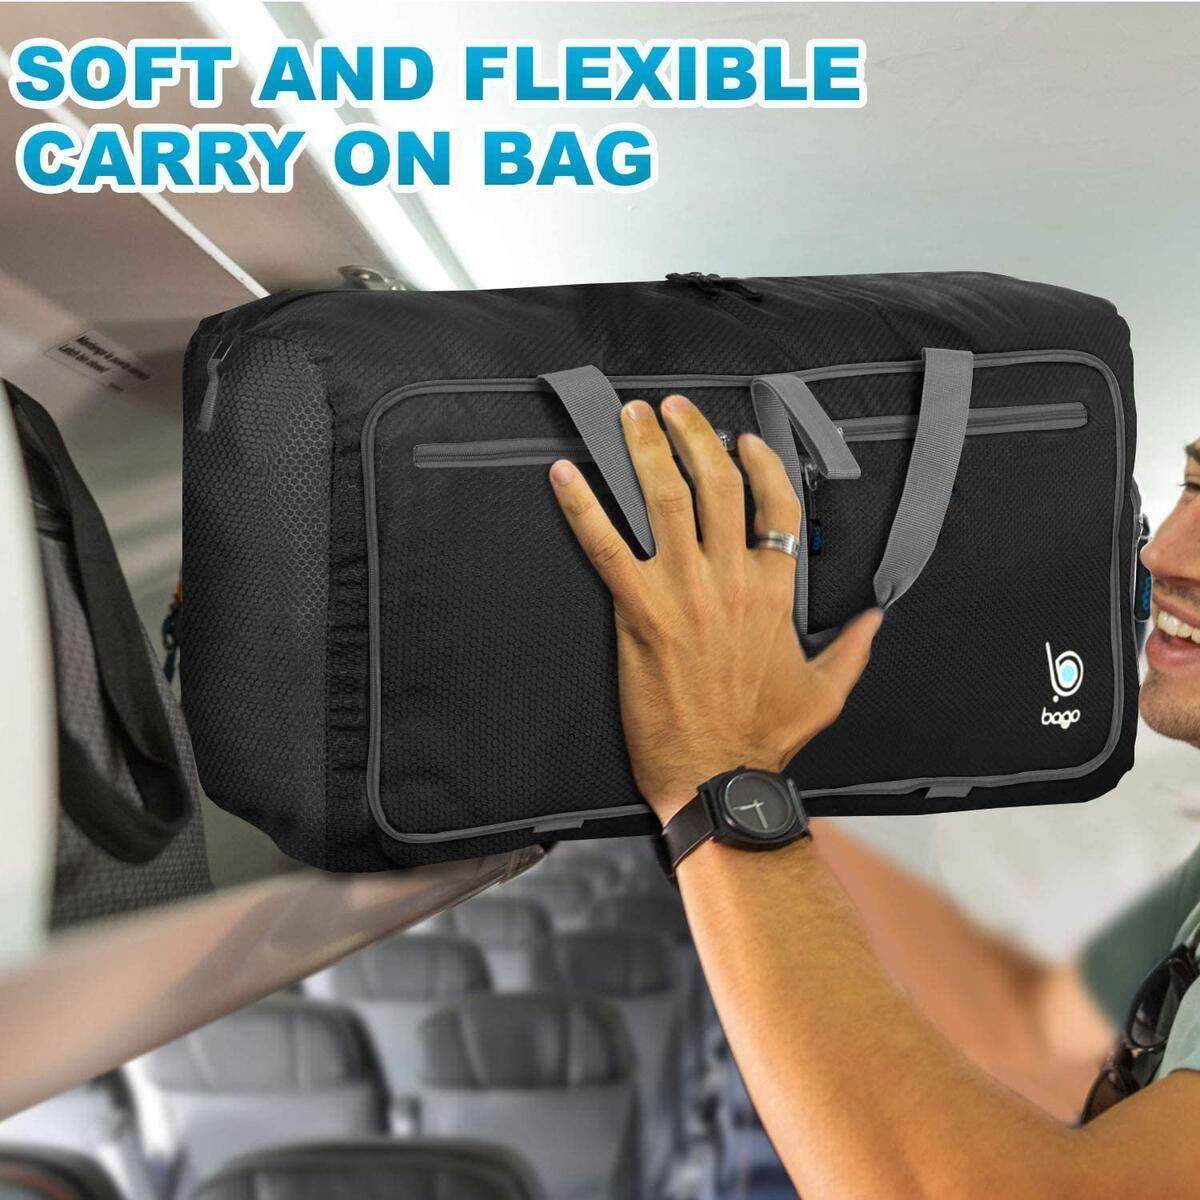 Bago Travel Duffel Bags for Men & Women - Lightweight Folding Duffle Bag Luggage - 80L Black